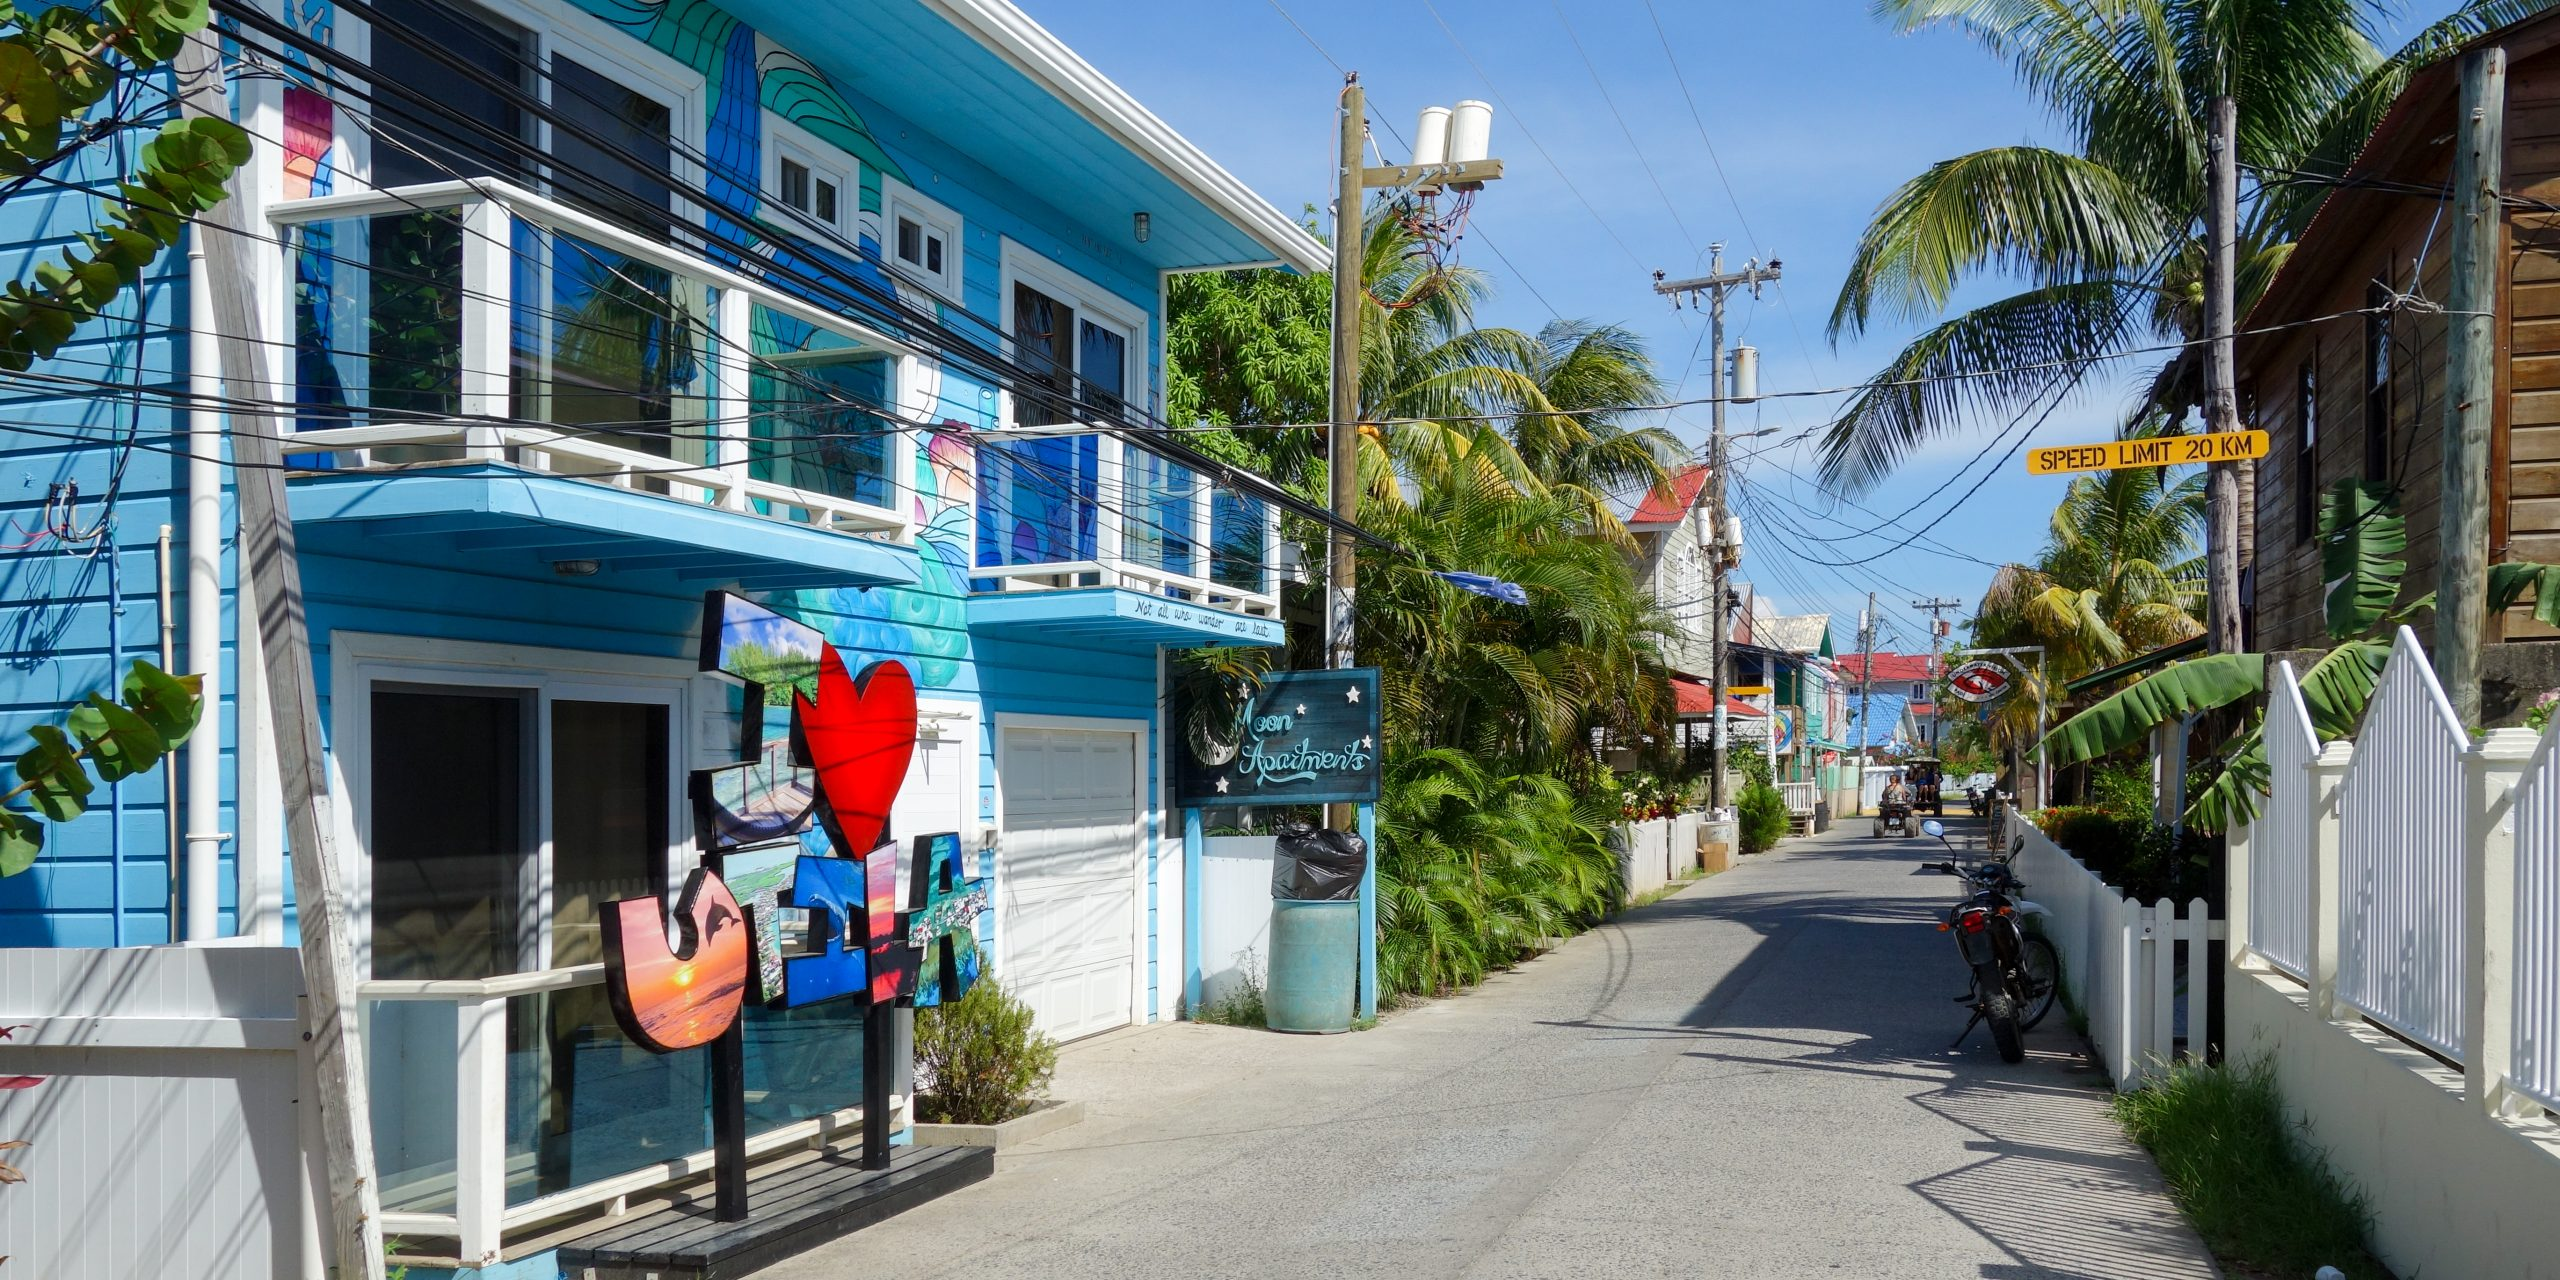 Street from Utila, Honduras